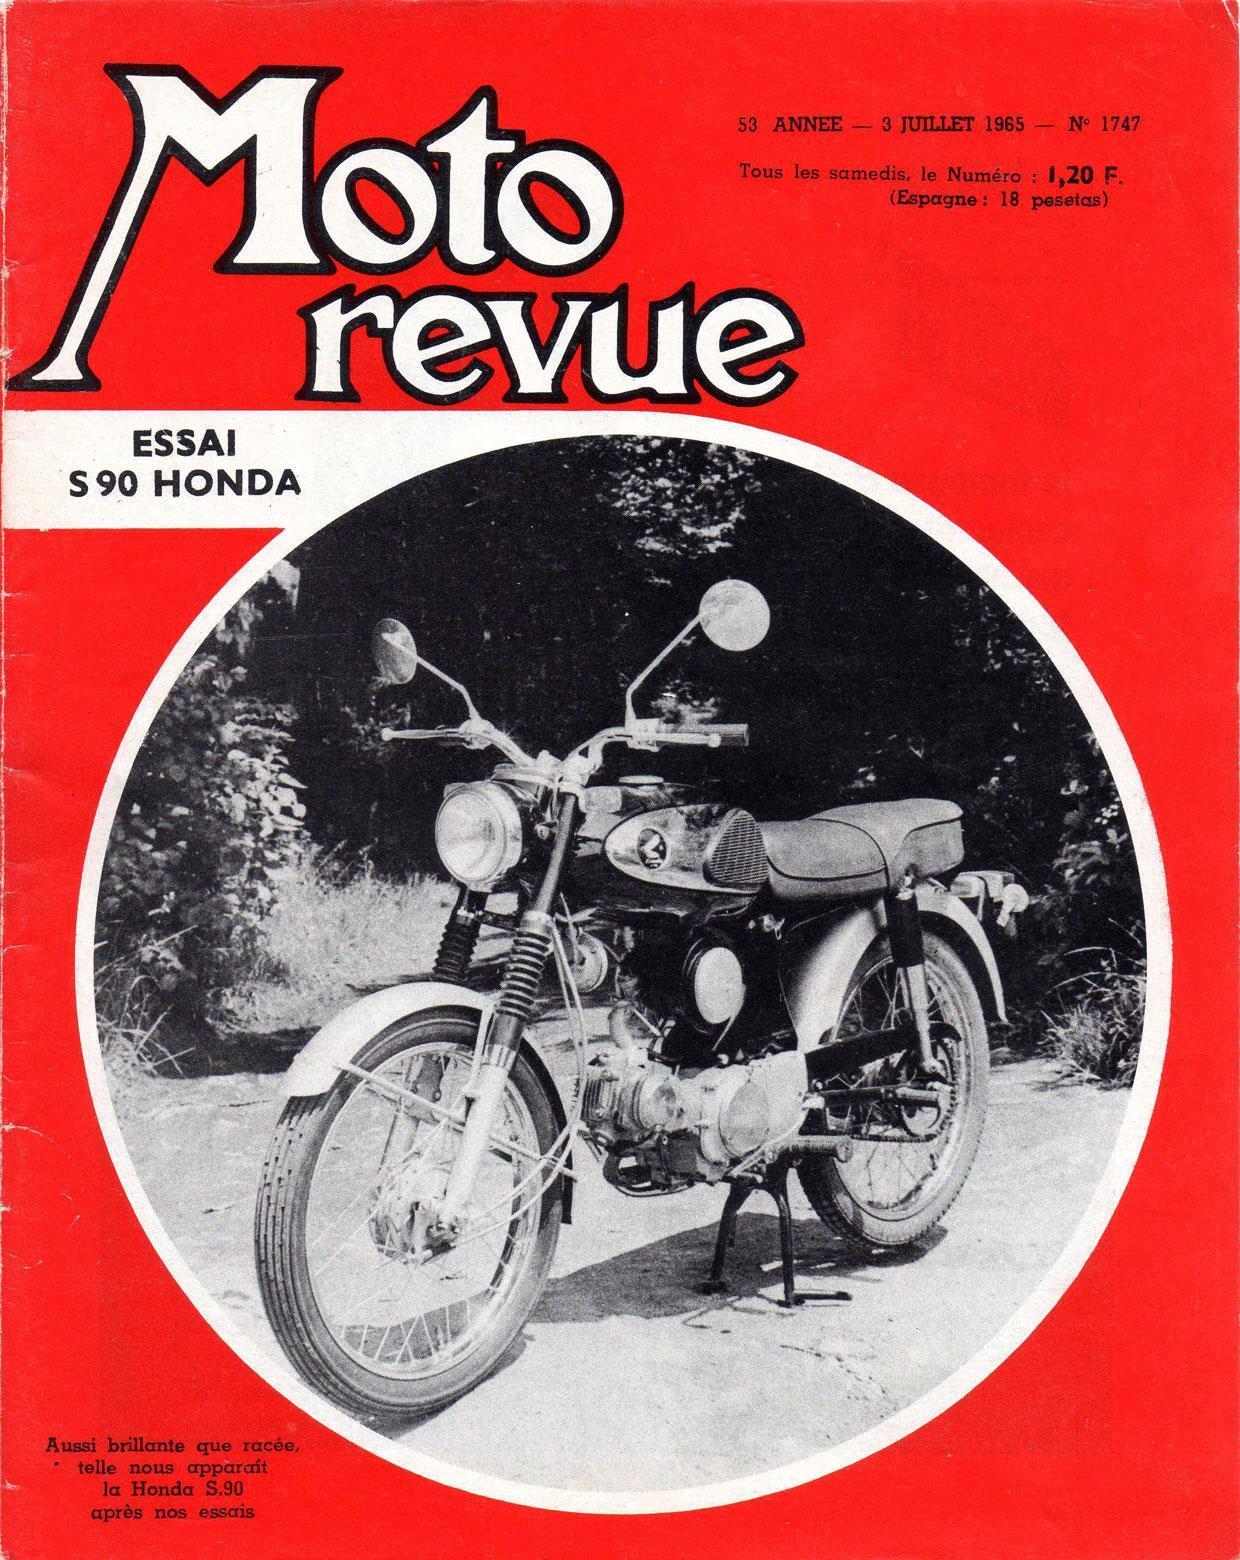 Moto Revue - 2 juilet 1965 - No. 1747